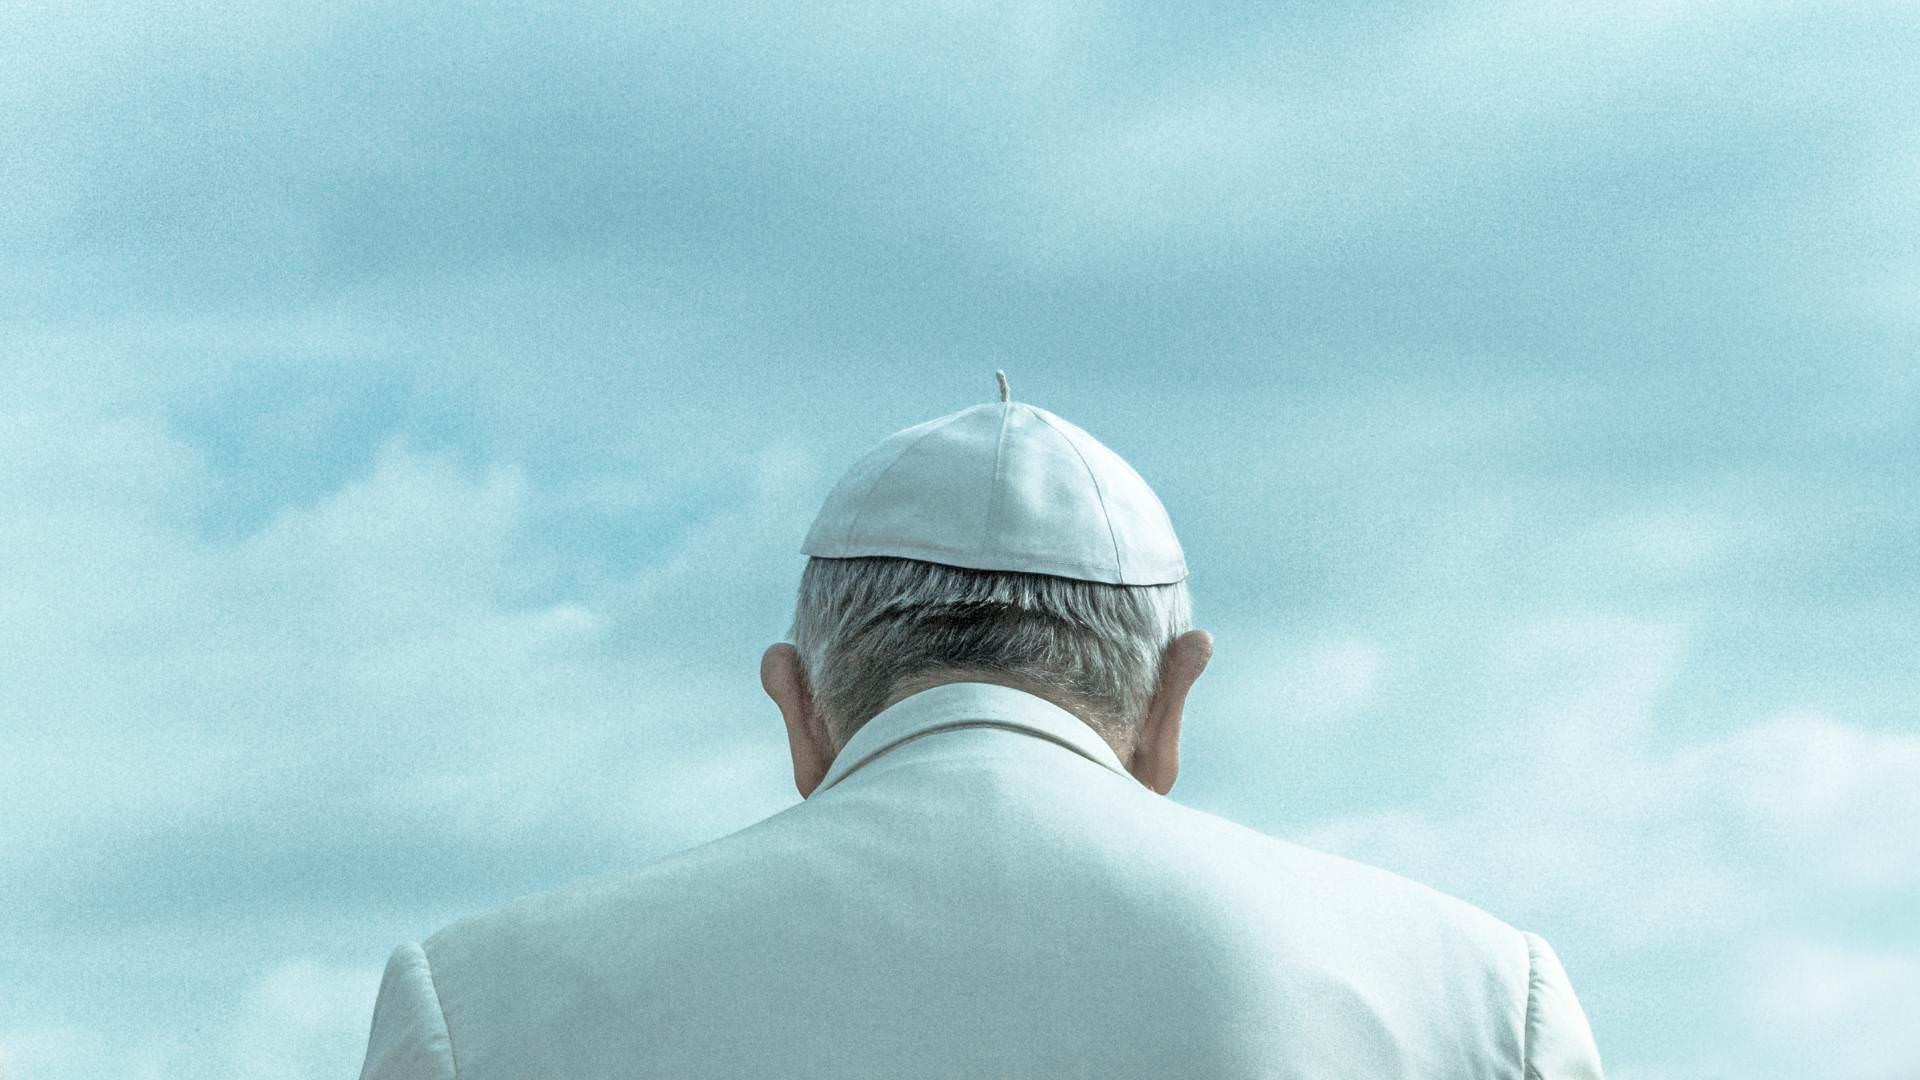 28 de maio: Bento XVI completa 43 anos como Bispo